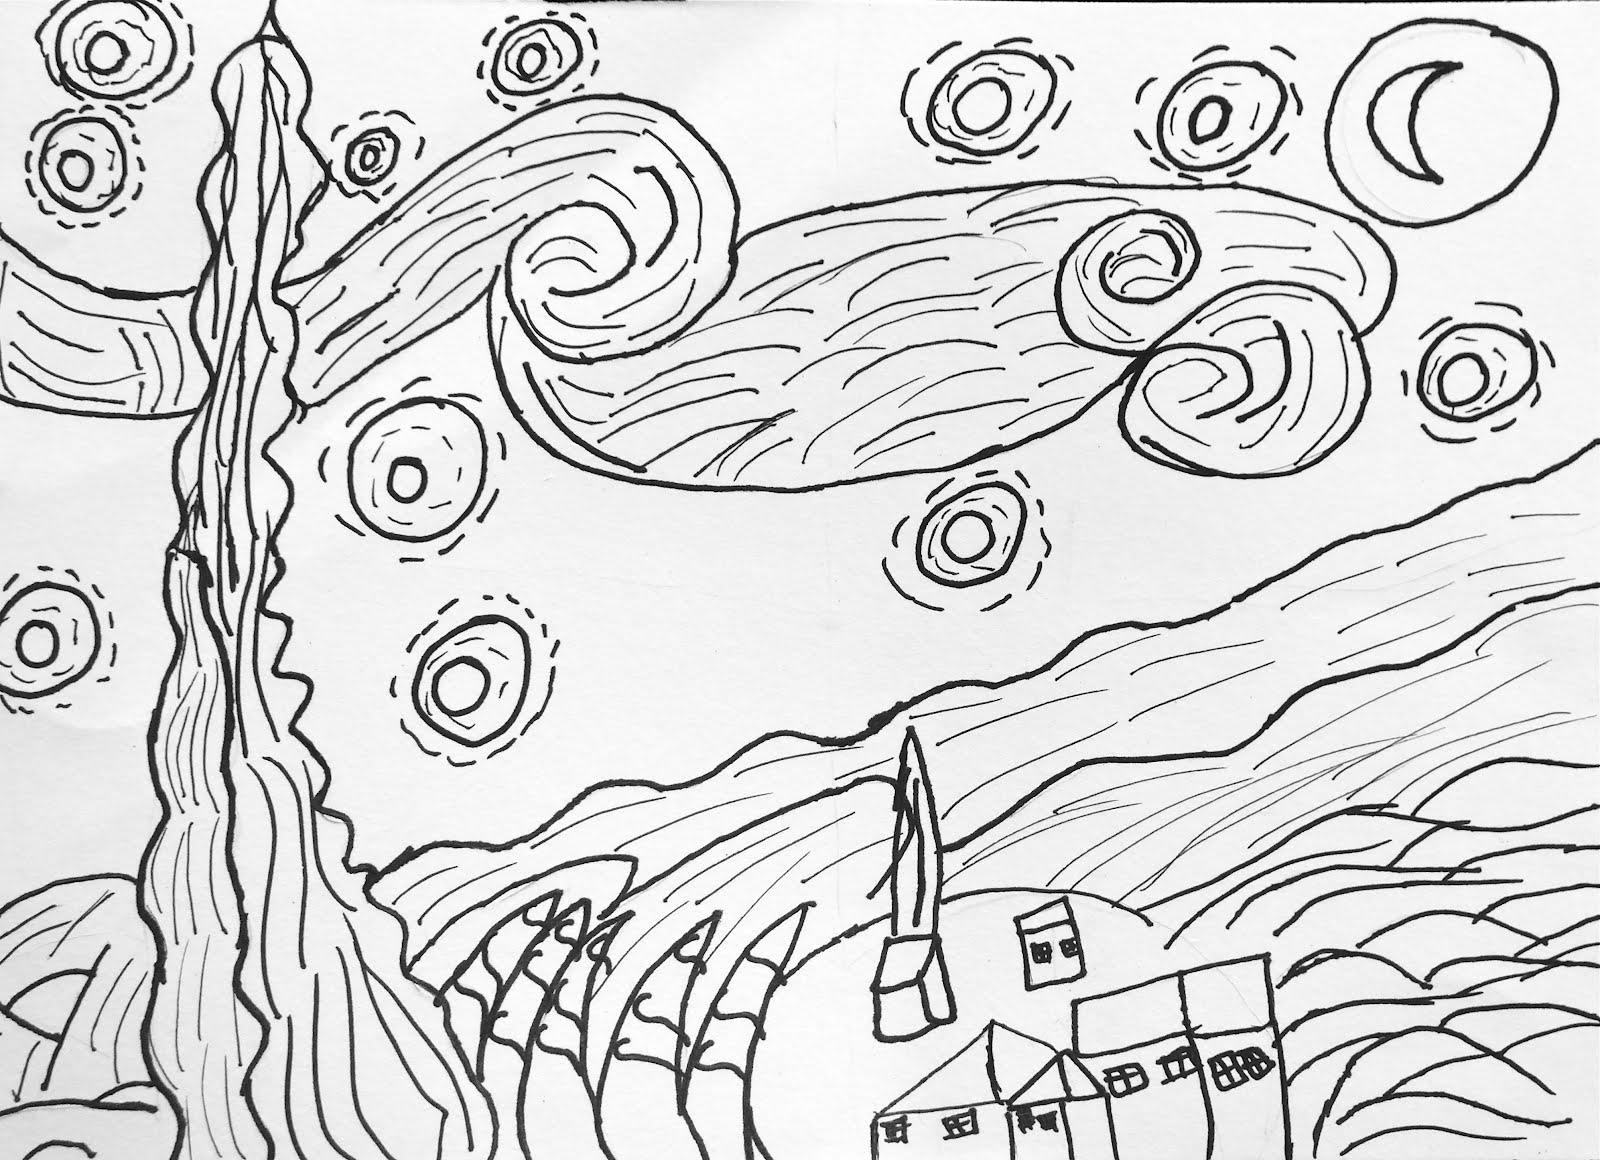 van gogh starry night coloring - Van Gogh Coloring Page